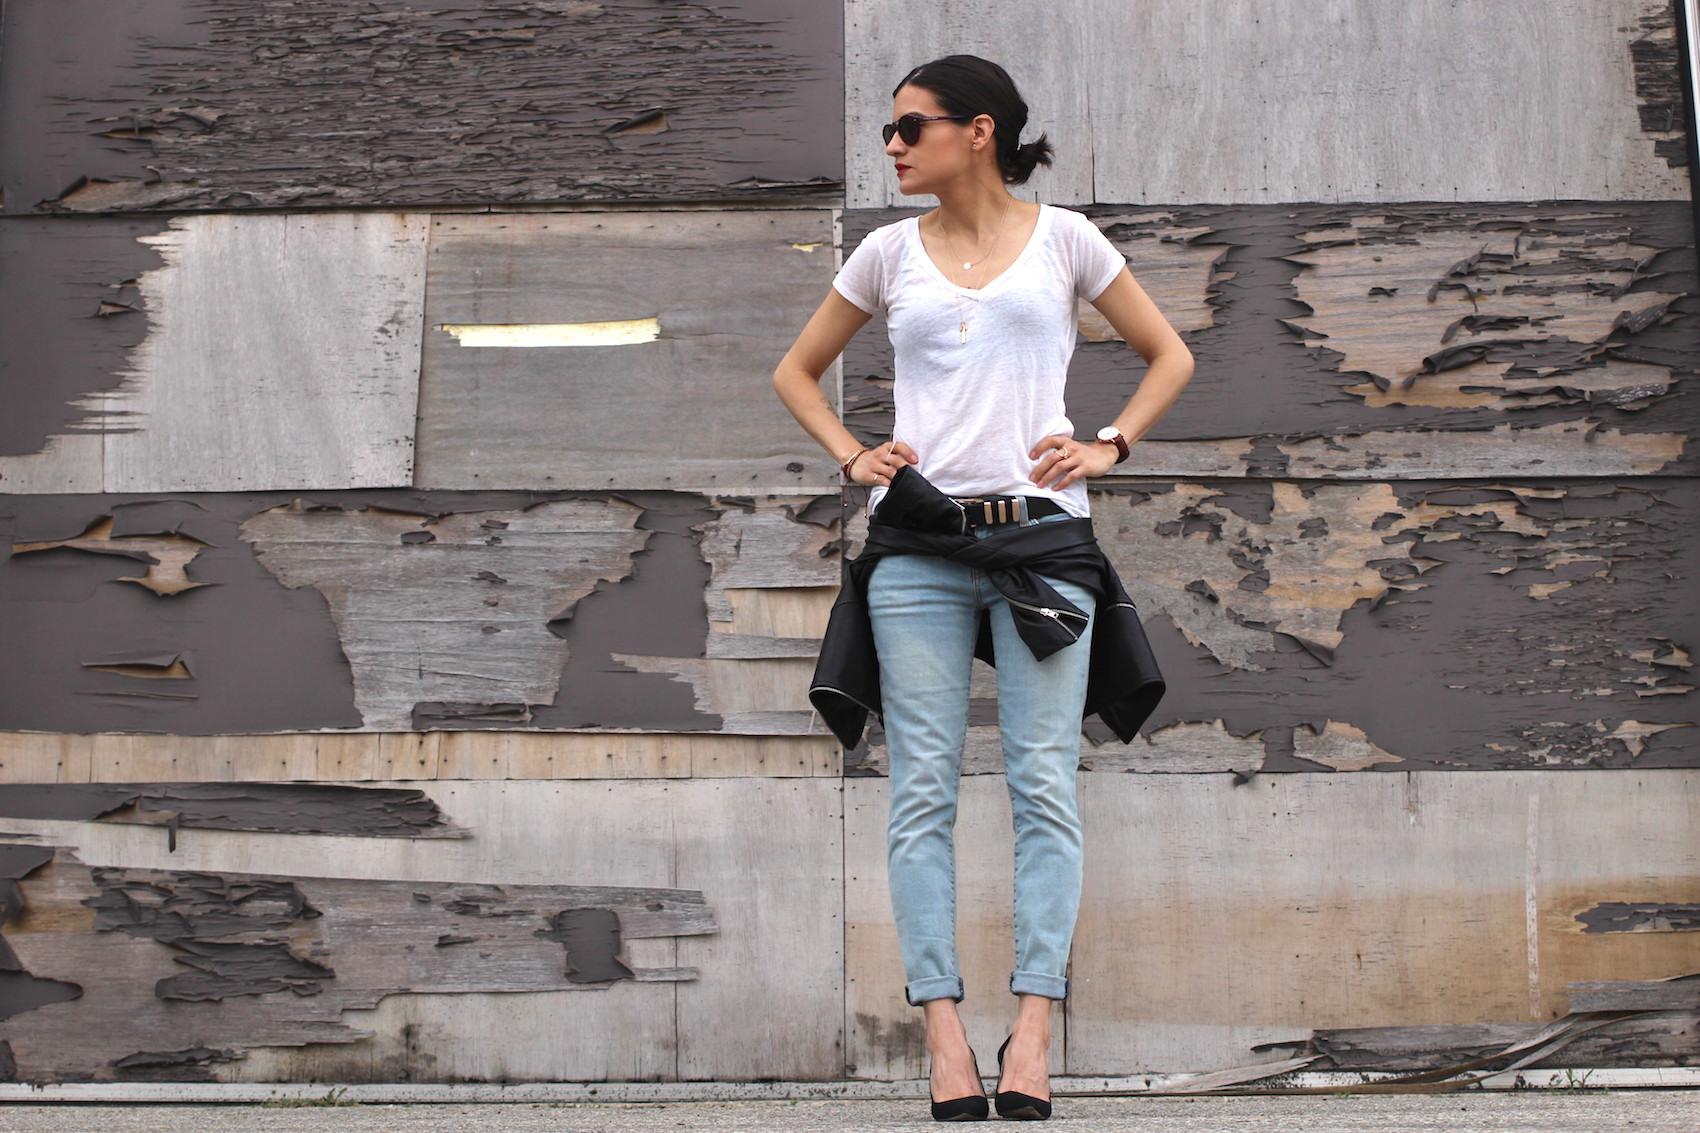 WoahStyle.com | Back to Basics #streetstyle Mackage leather jacket, blue jeans, black pumps and a white tshirt_1635.JPG